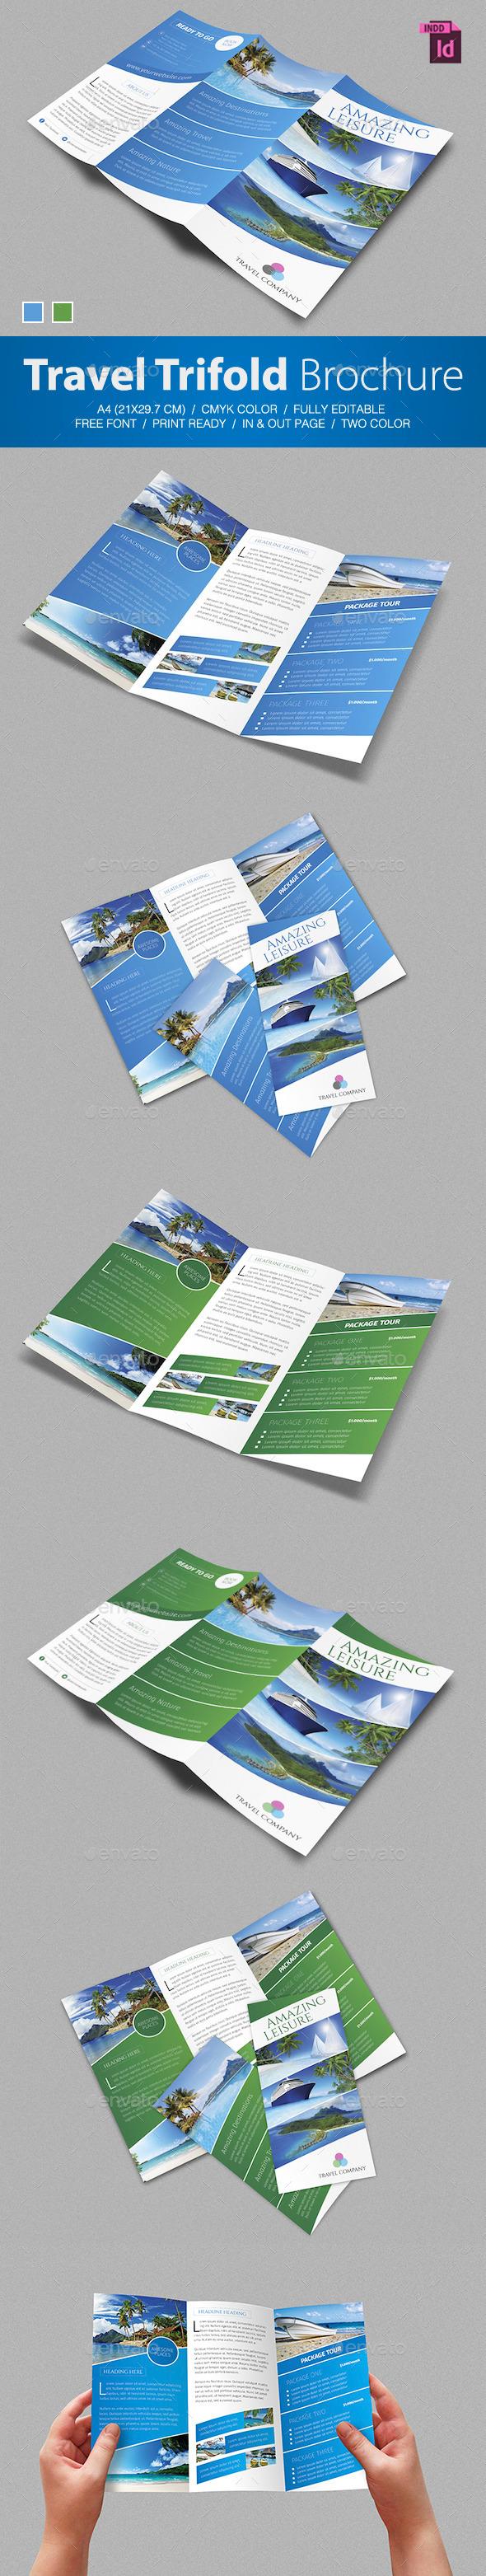 GraphicRiver Travel Trifold Brochure 8883114